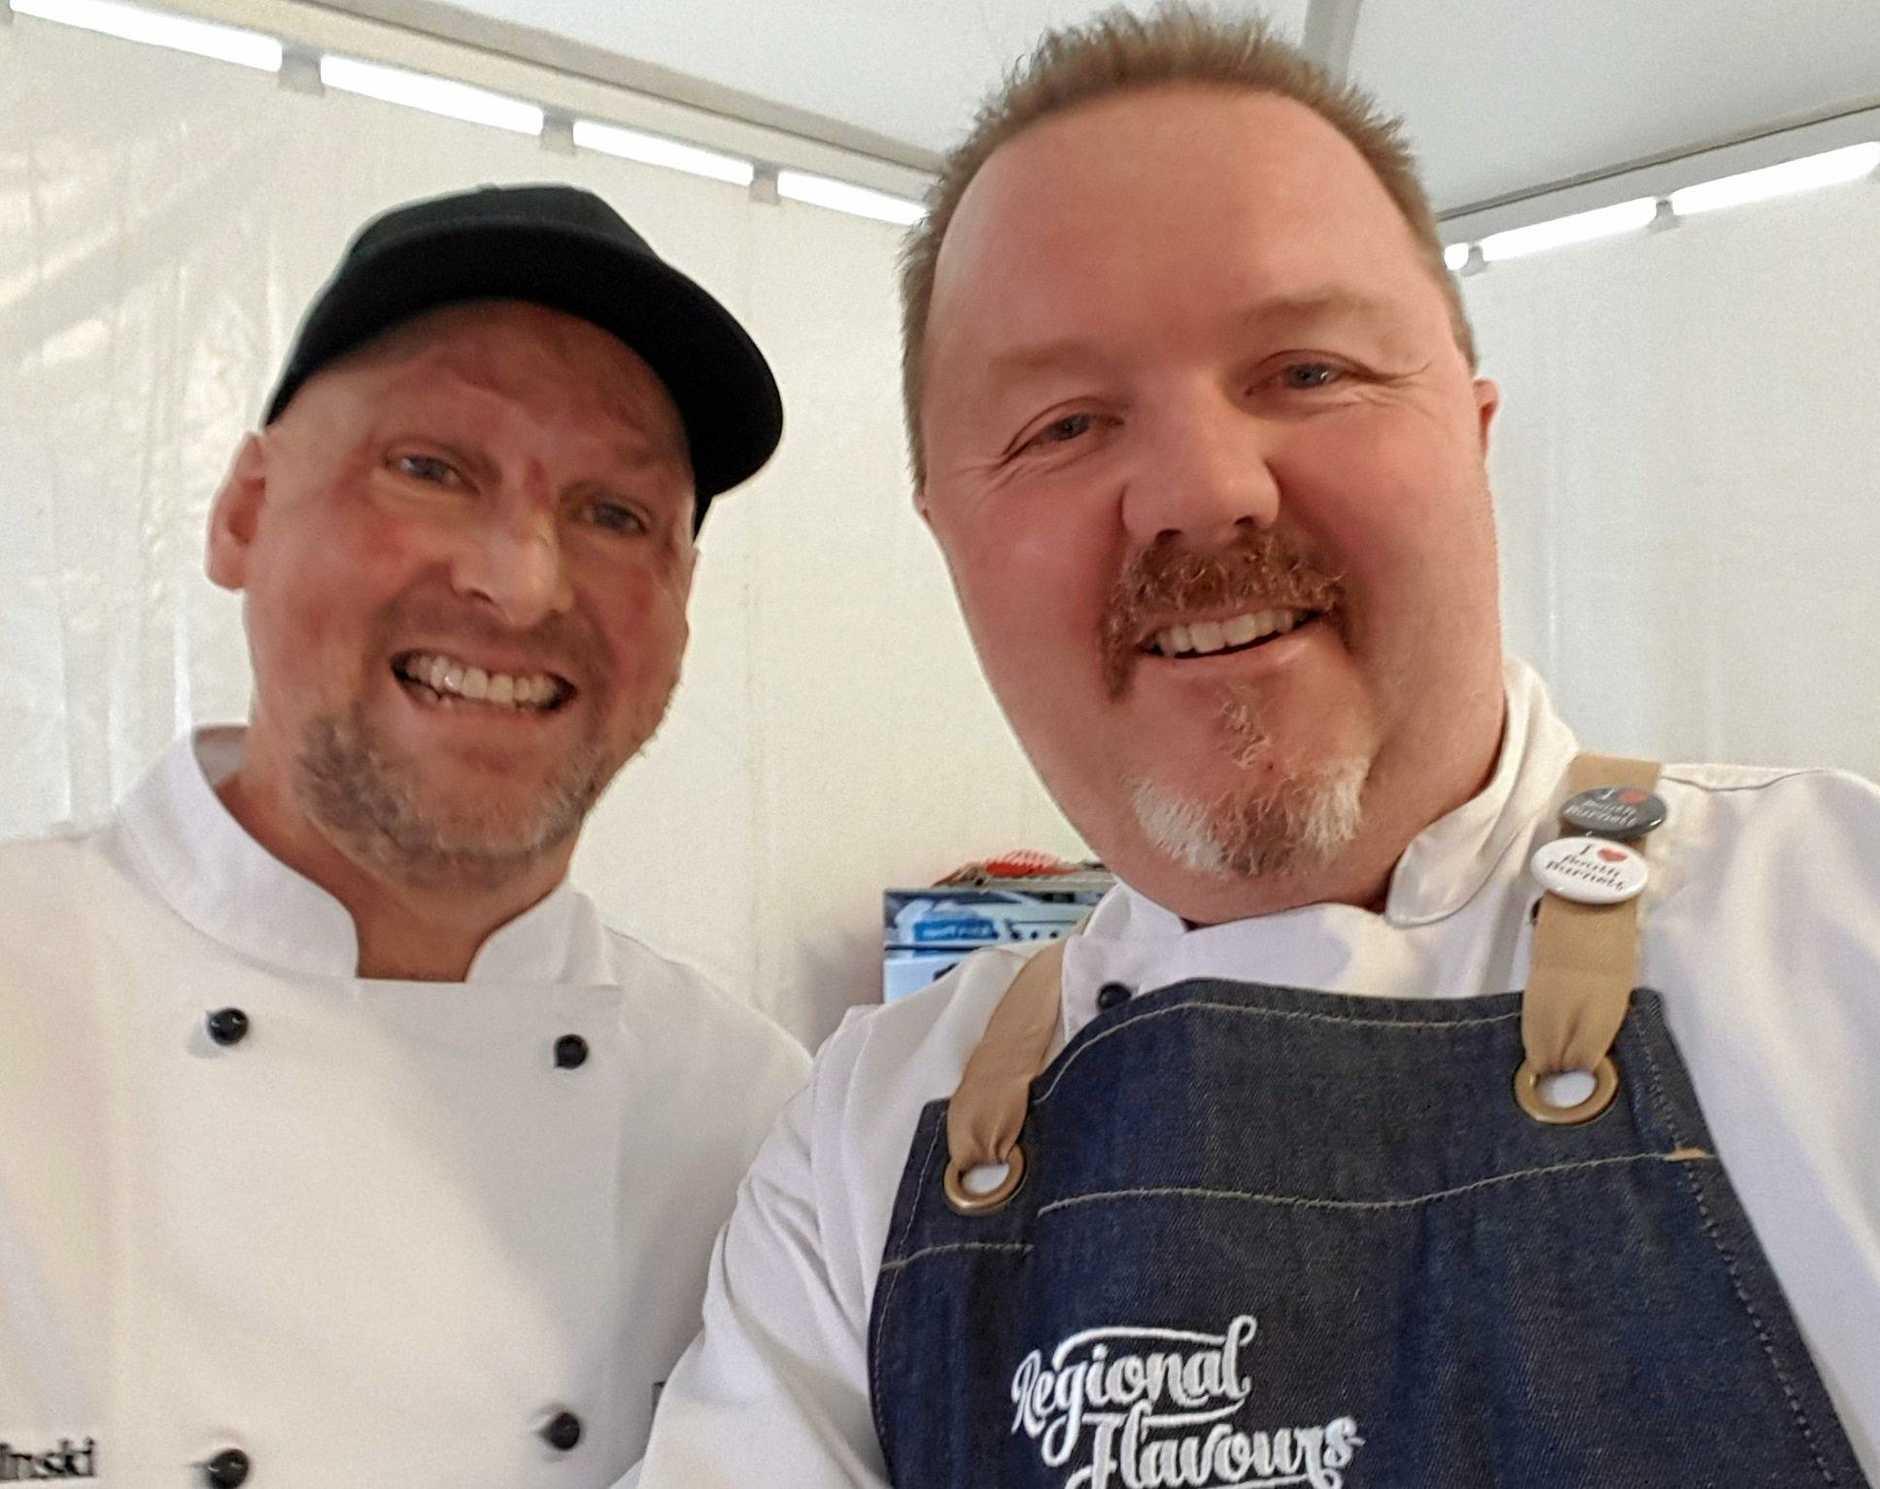 THE BEST: Gympie food ambassador, Matt Golinski and South Burnett food ambassador, Jason Ford praise our produce